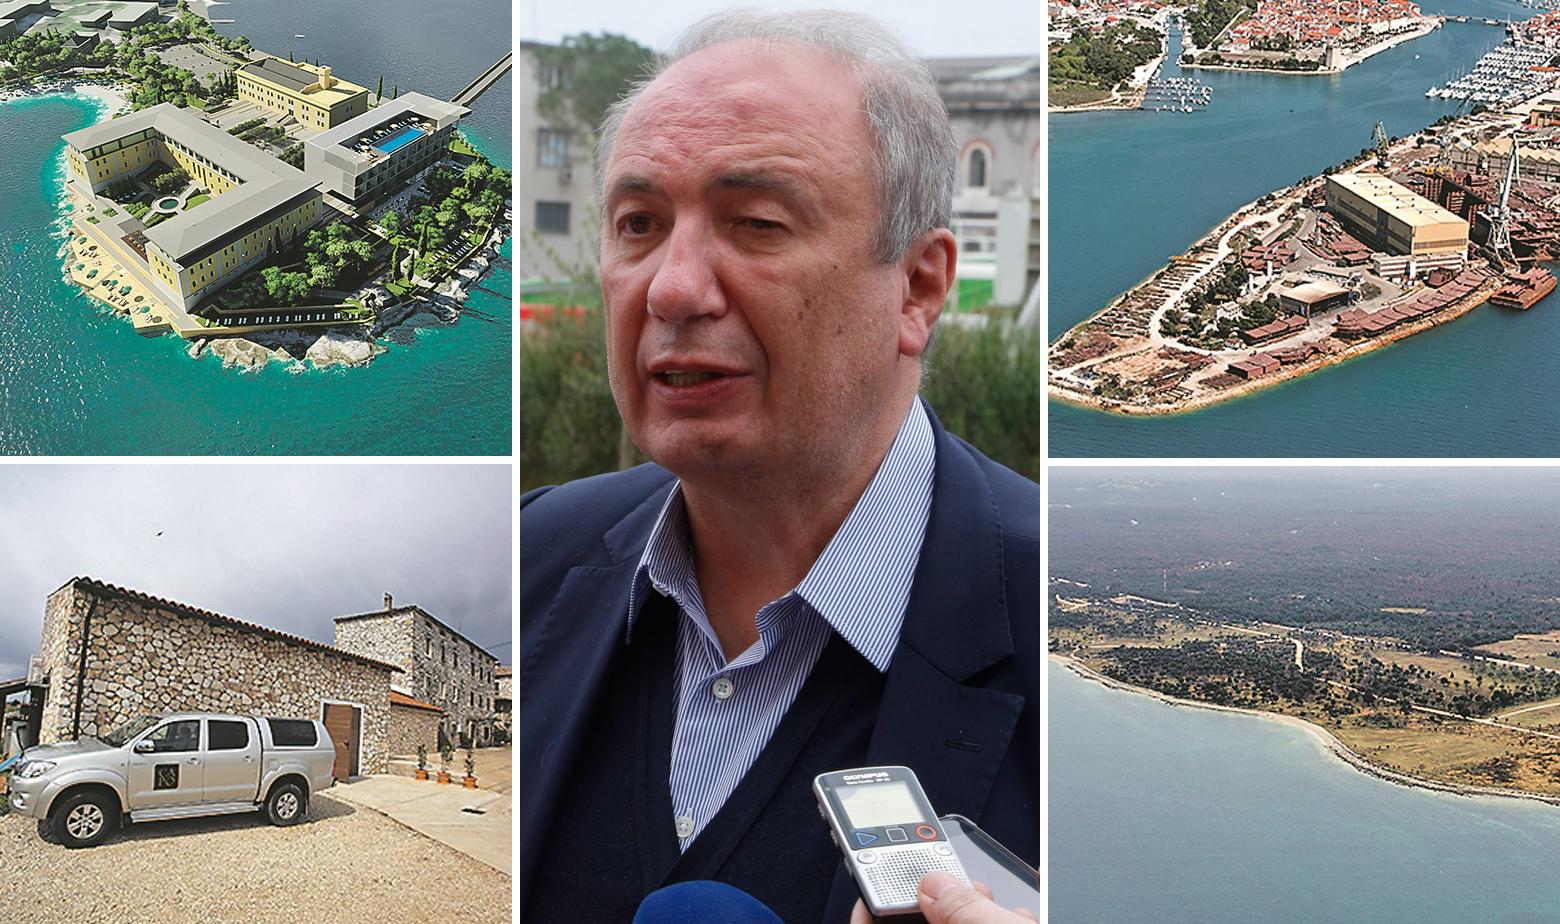 Danko Končar i slike projekta Svete Katarine, Vinarije Capo, Brodotrogira i zemljište u Barbarigi